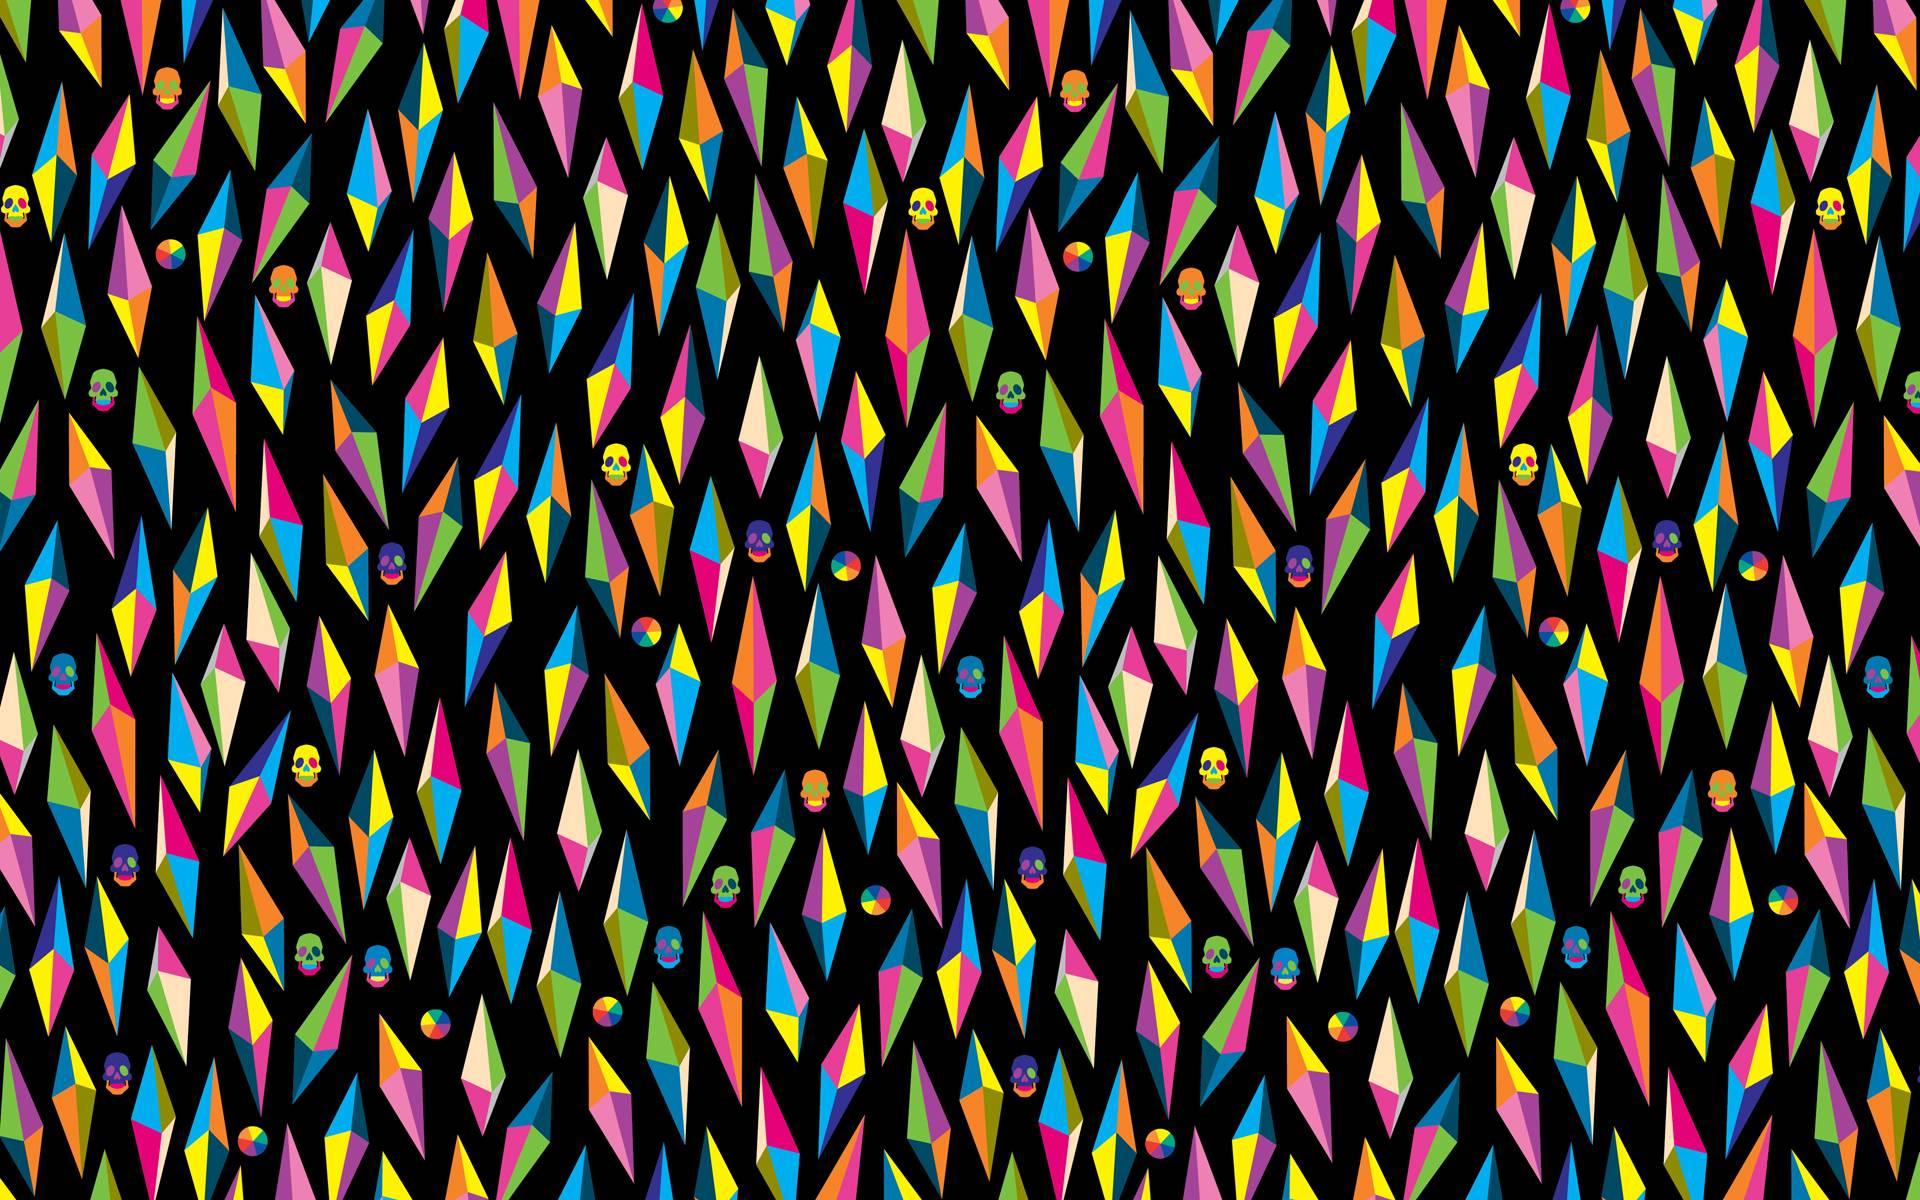 Artsy HD Wallpapers 1920x1200